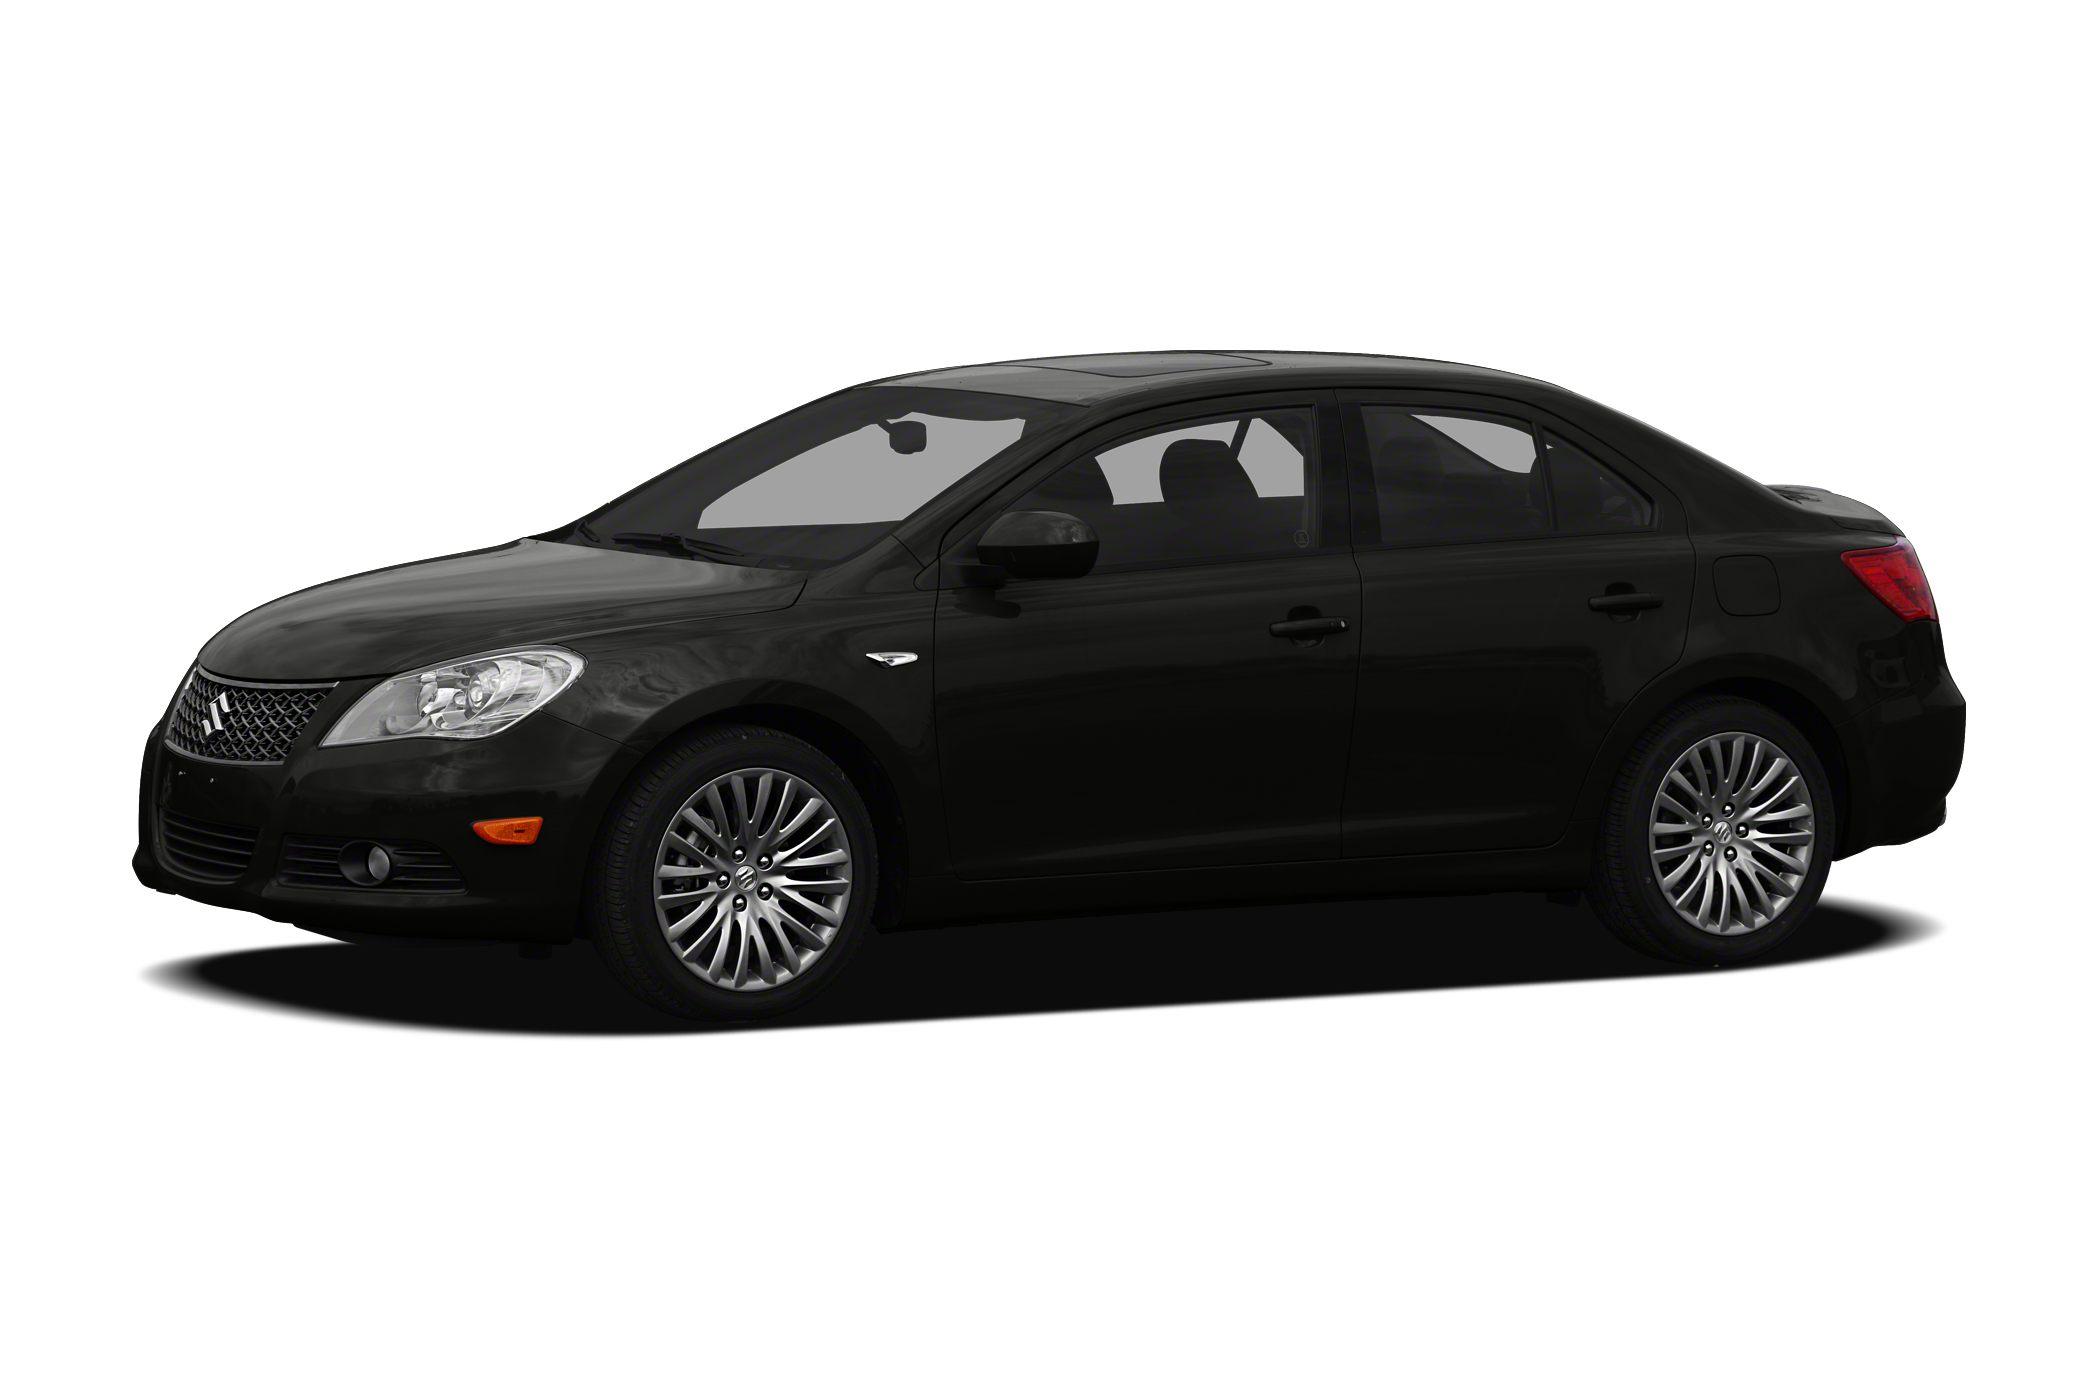 2011 Suzuki Kizashi SE Sedan for sale in Wichita for $14,517 with 29,834 miles.